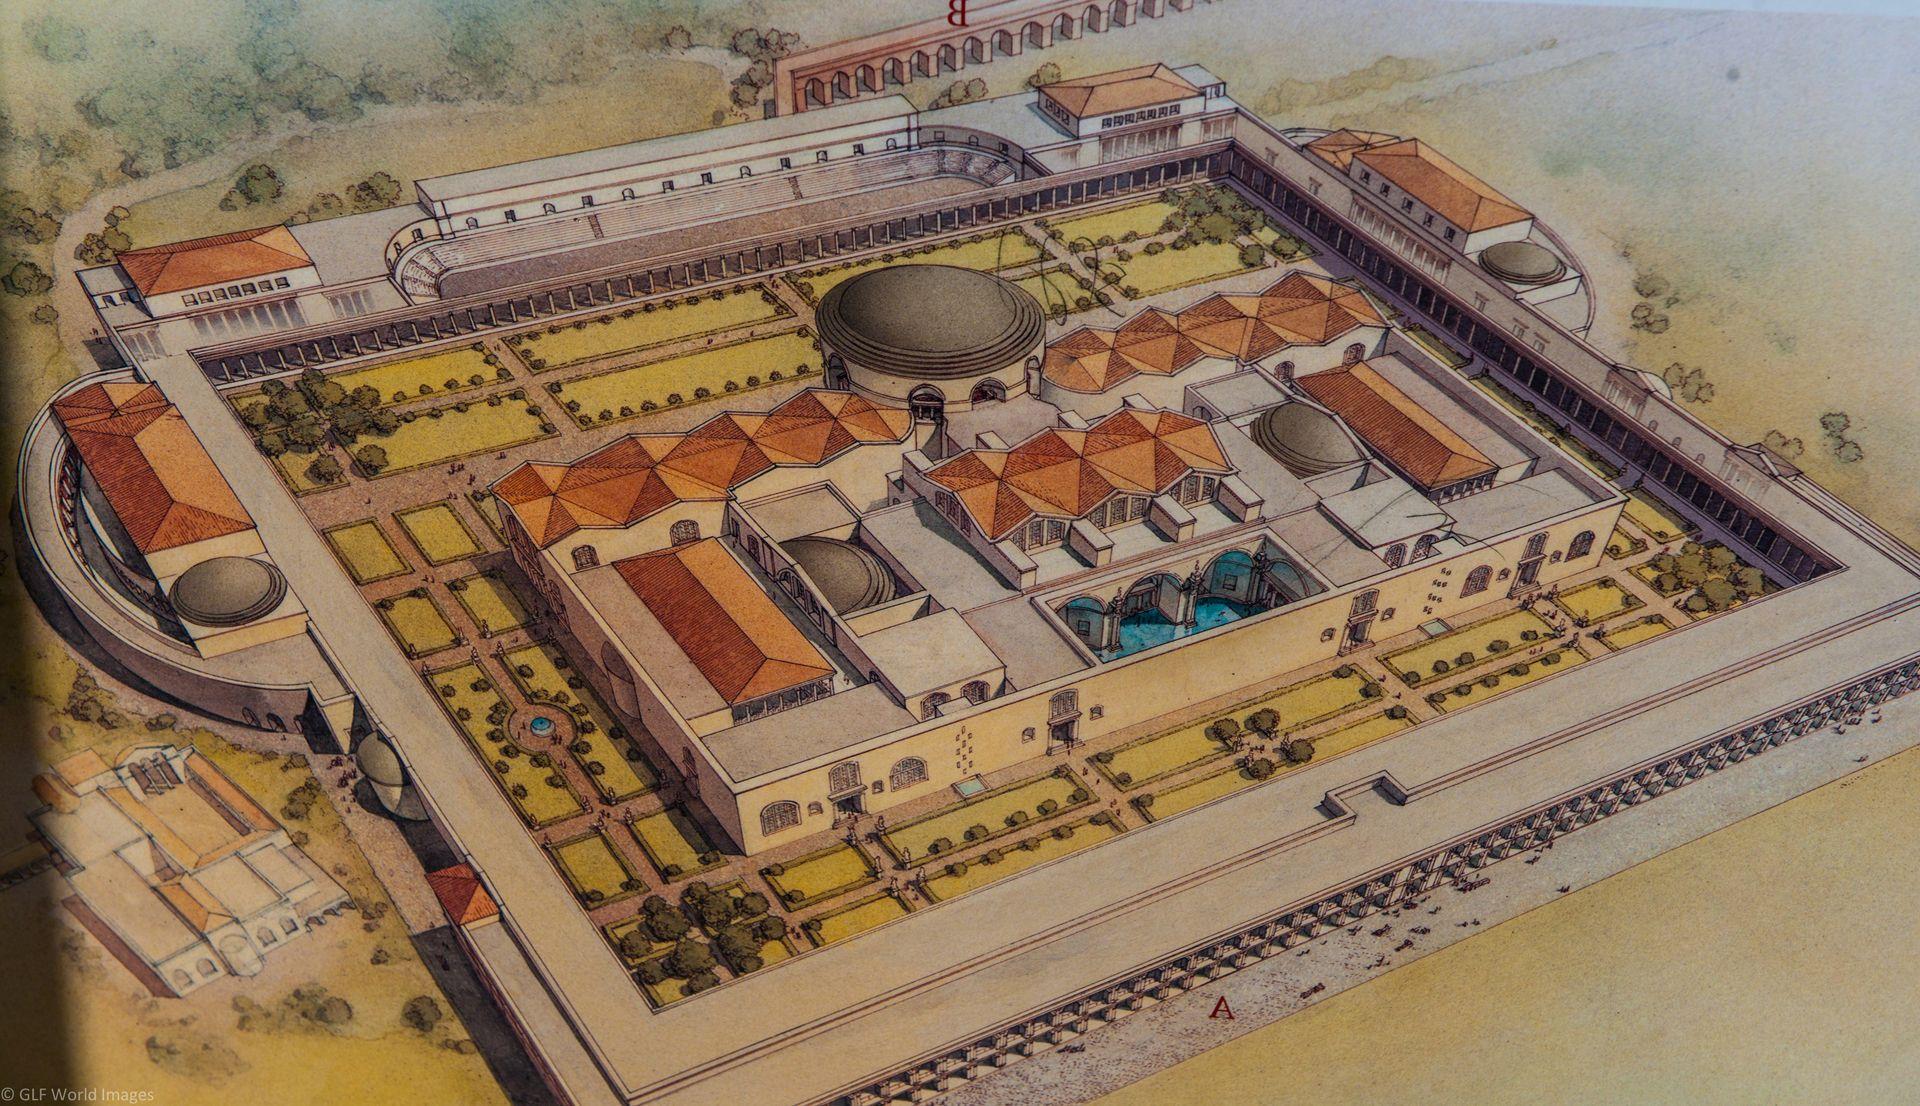 p g 27 termas de caracalla tudo sobre a casa pinterest roman emperor and emperor. Black Bedroom Furniture Sets. Home Design Ideas